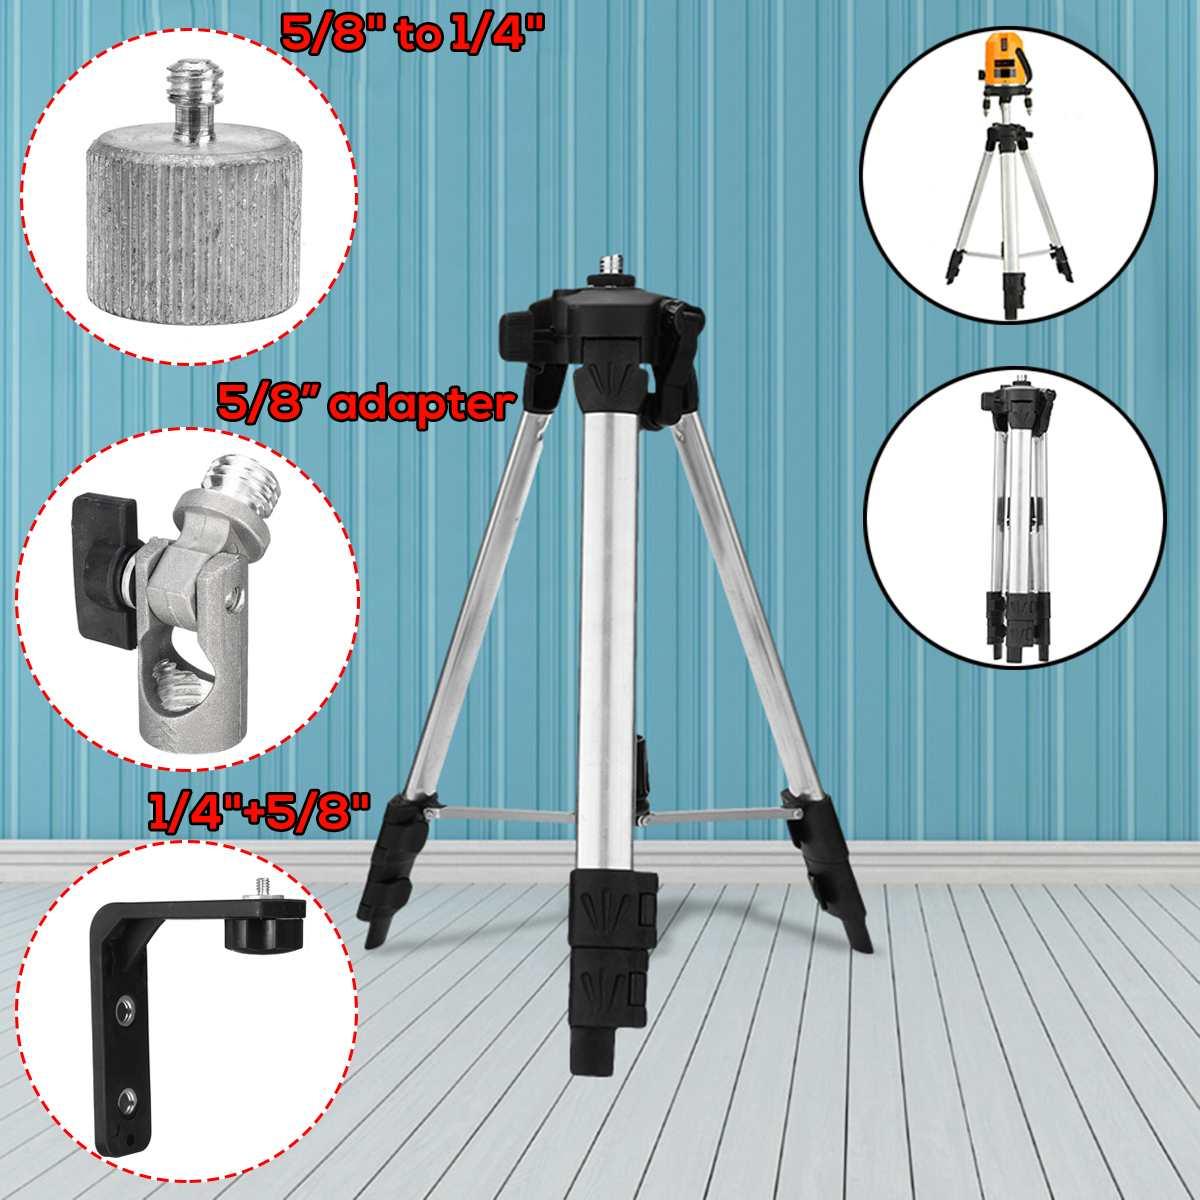 "Adjustable Camera Tripod Stand Holder for Laser Level Measurement Tool L Type Magnet Bracket +5/8'' to 1/4"" +5/8"" Adapter"